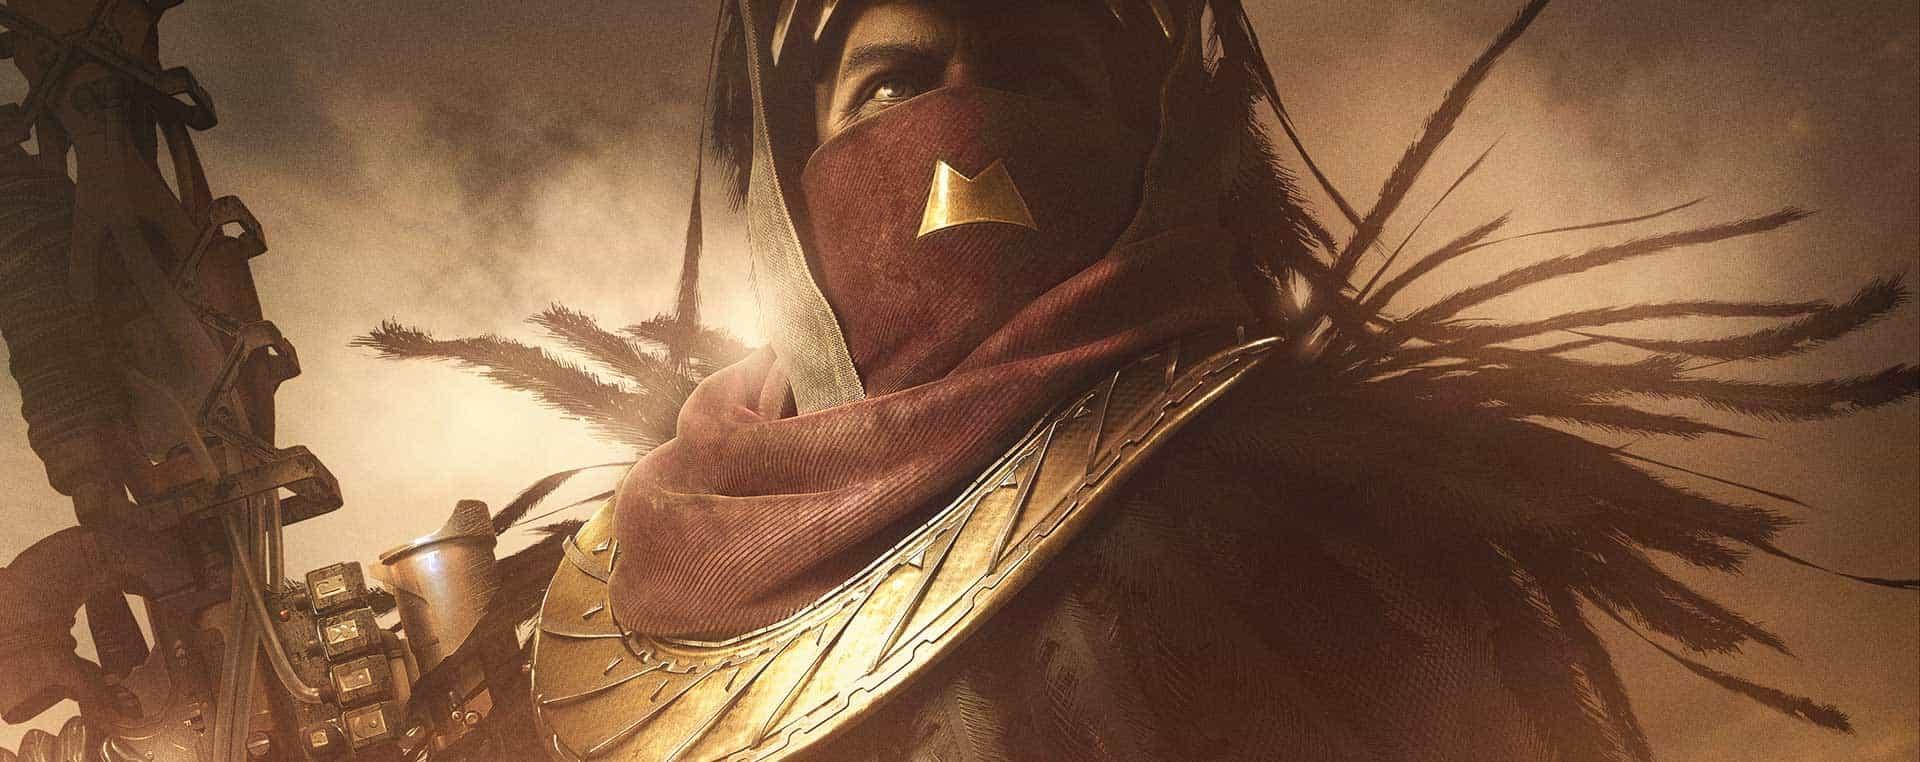 Curse of Osiris kao prvi Destiny 2 DLC ima nezahvalan posao